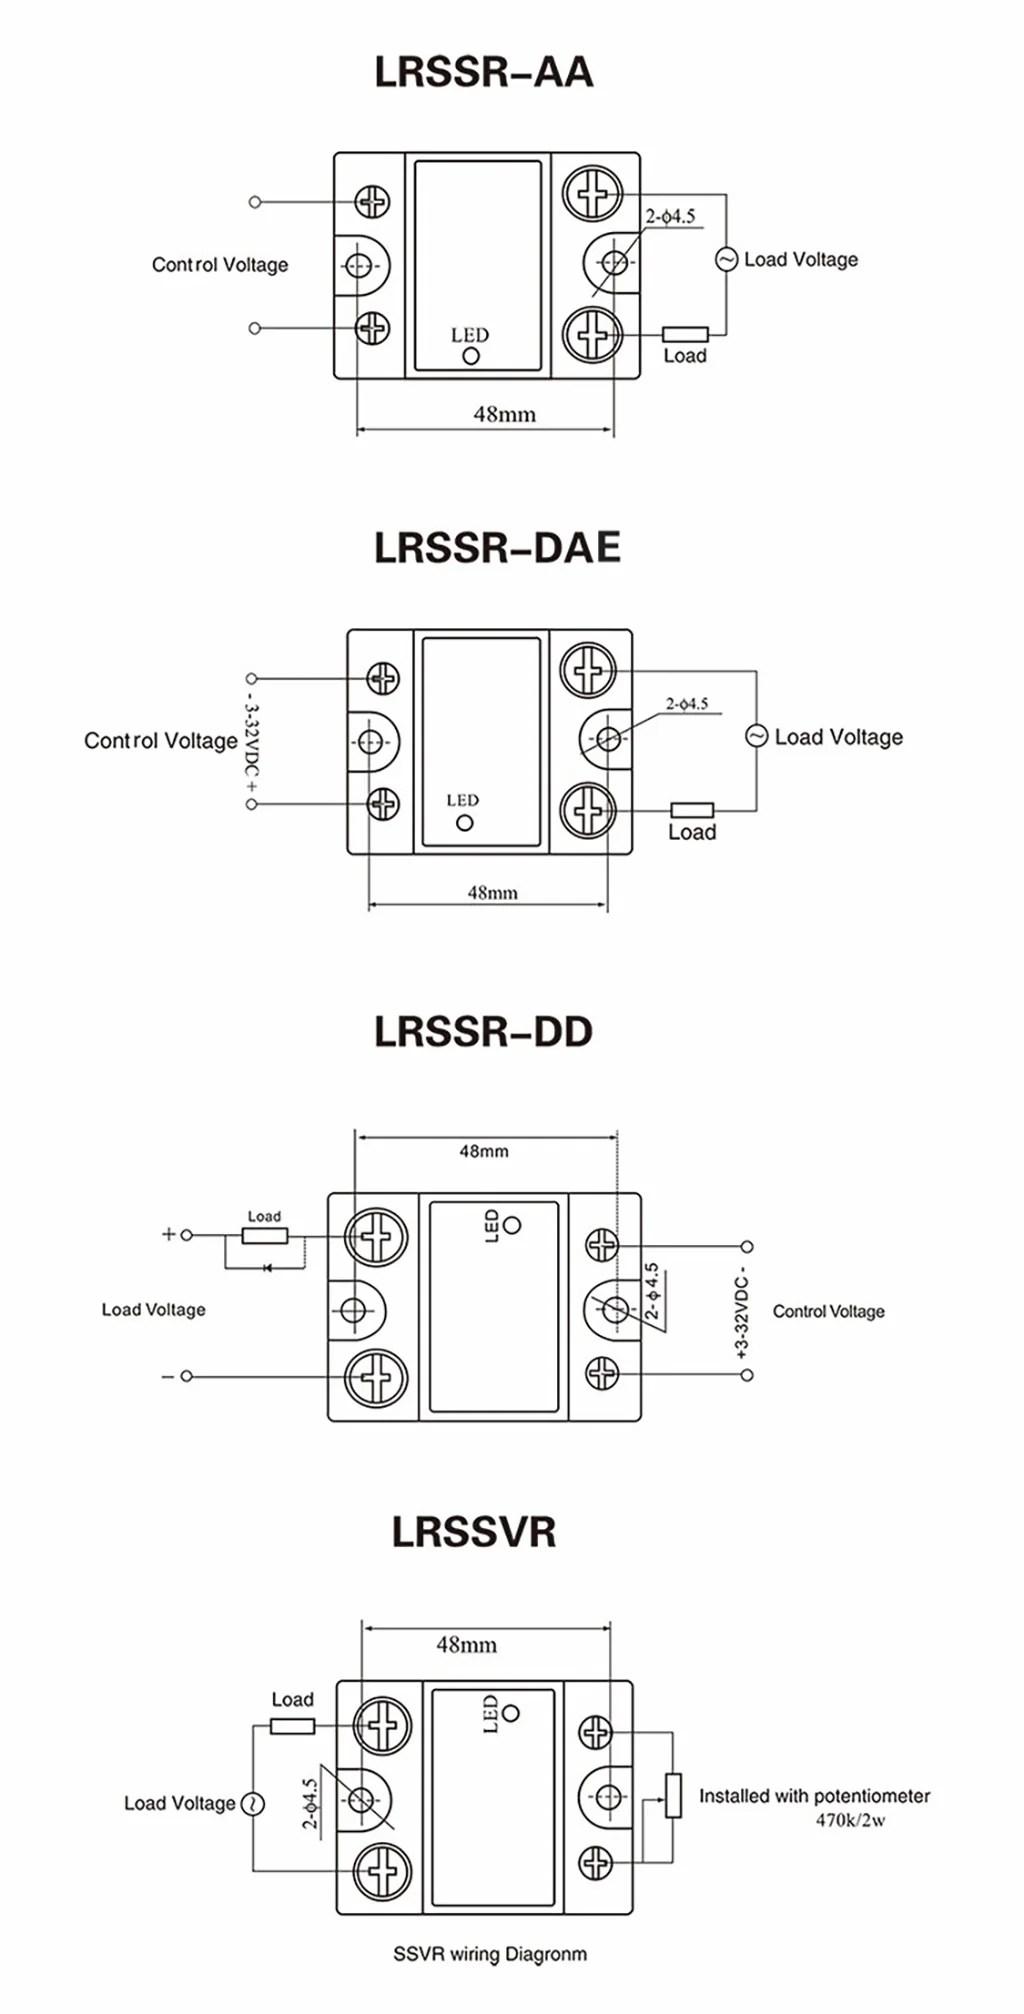 medium resolution of connecting diagram lrssr